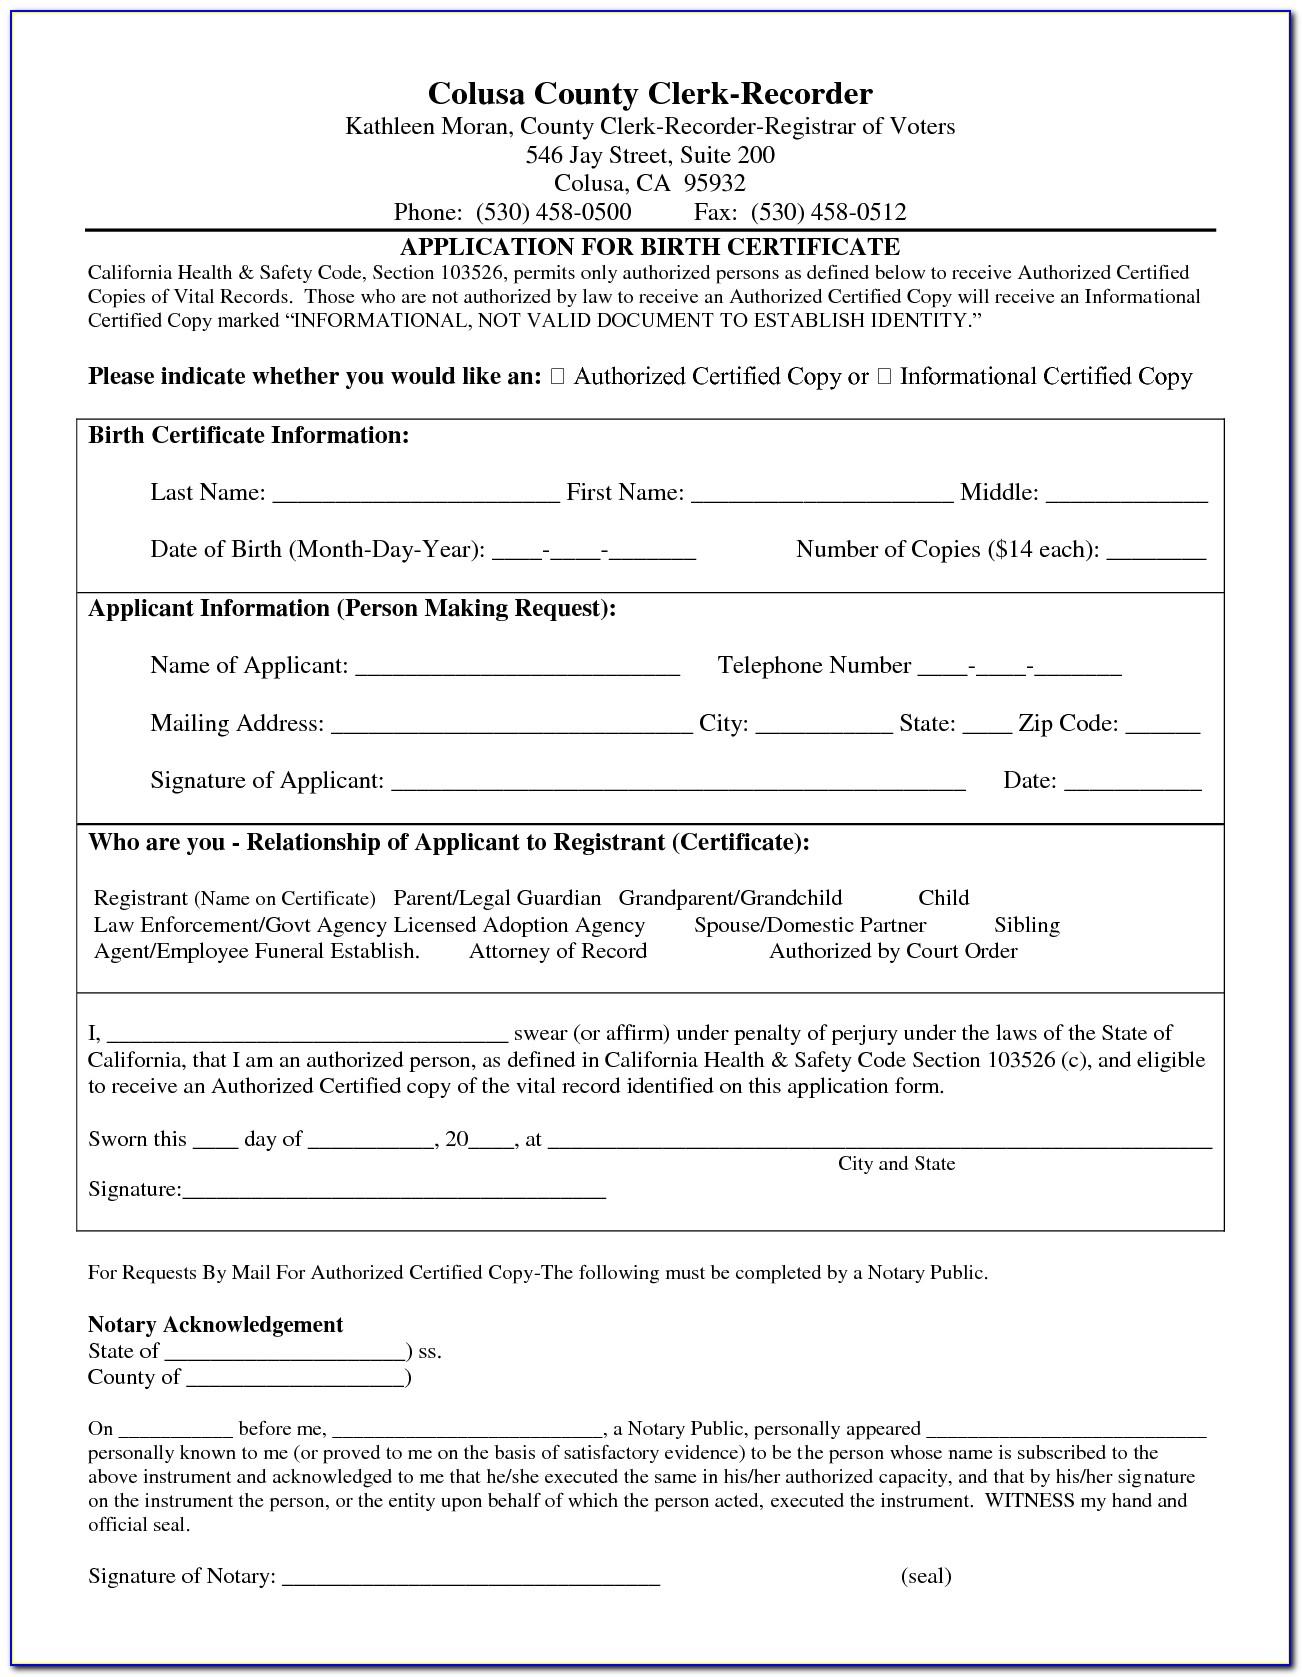 California Birth Certificate Request Form